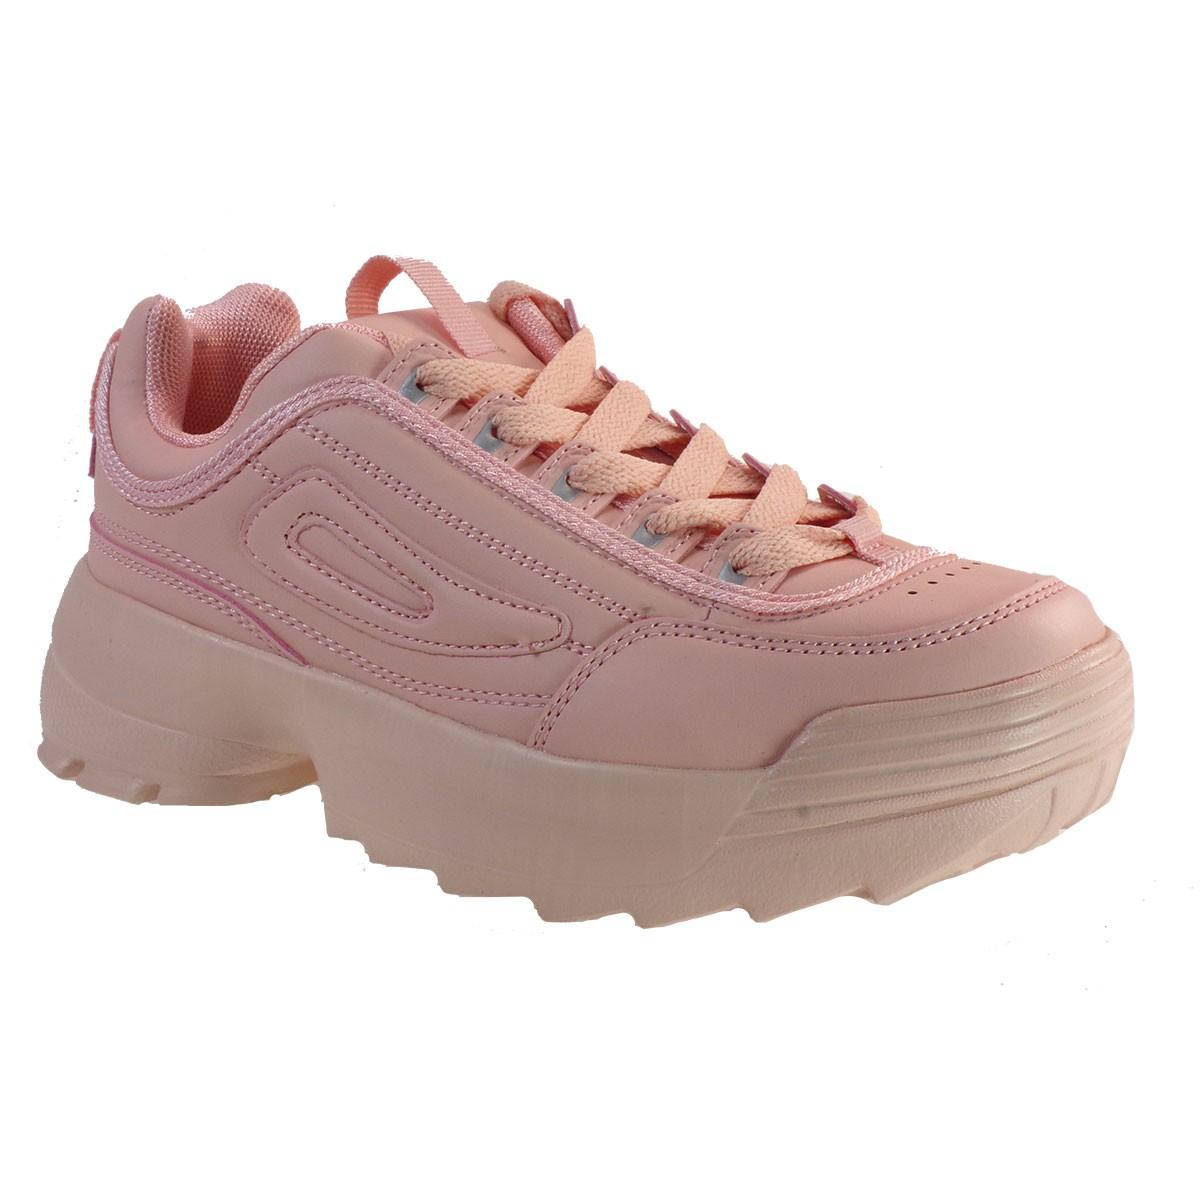 Bagiota Shoes Γυναικεία Παπούτσια Sneakers Αθλητικά 011-3 Ρόζ